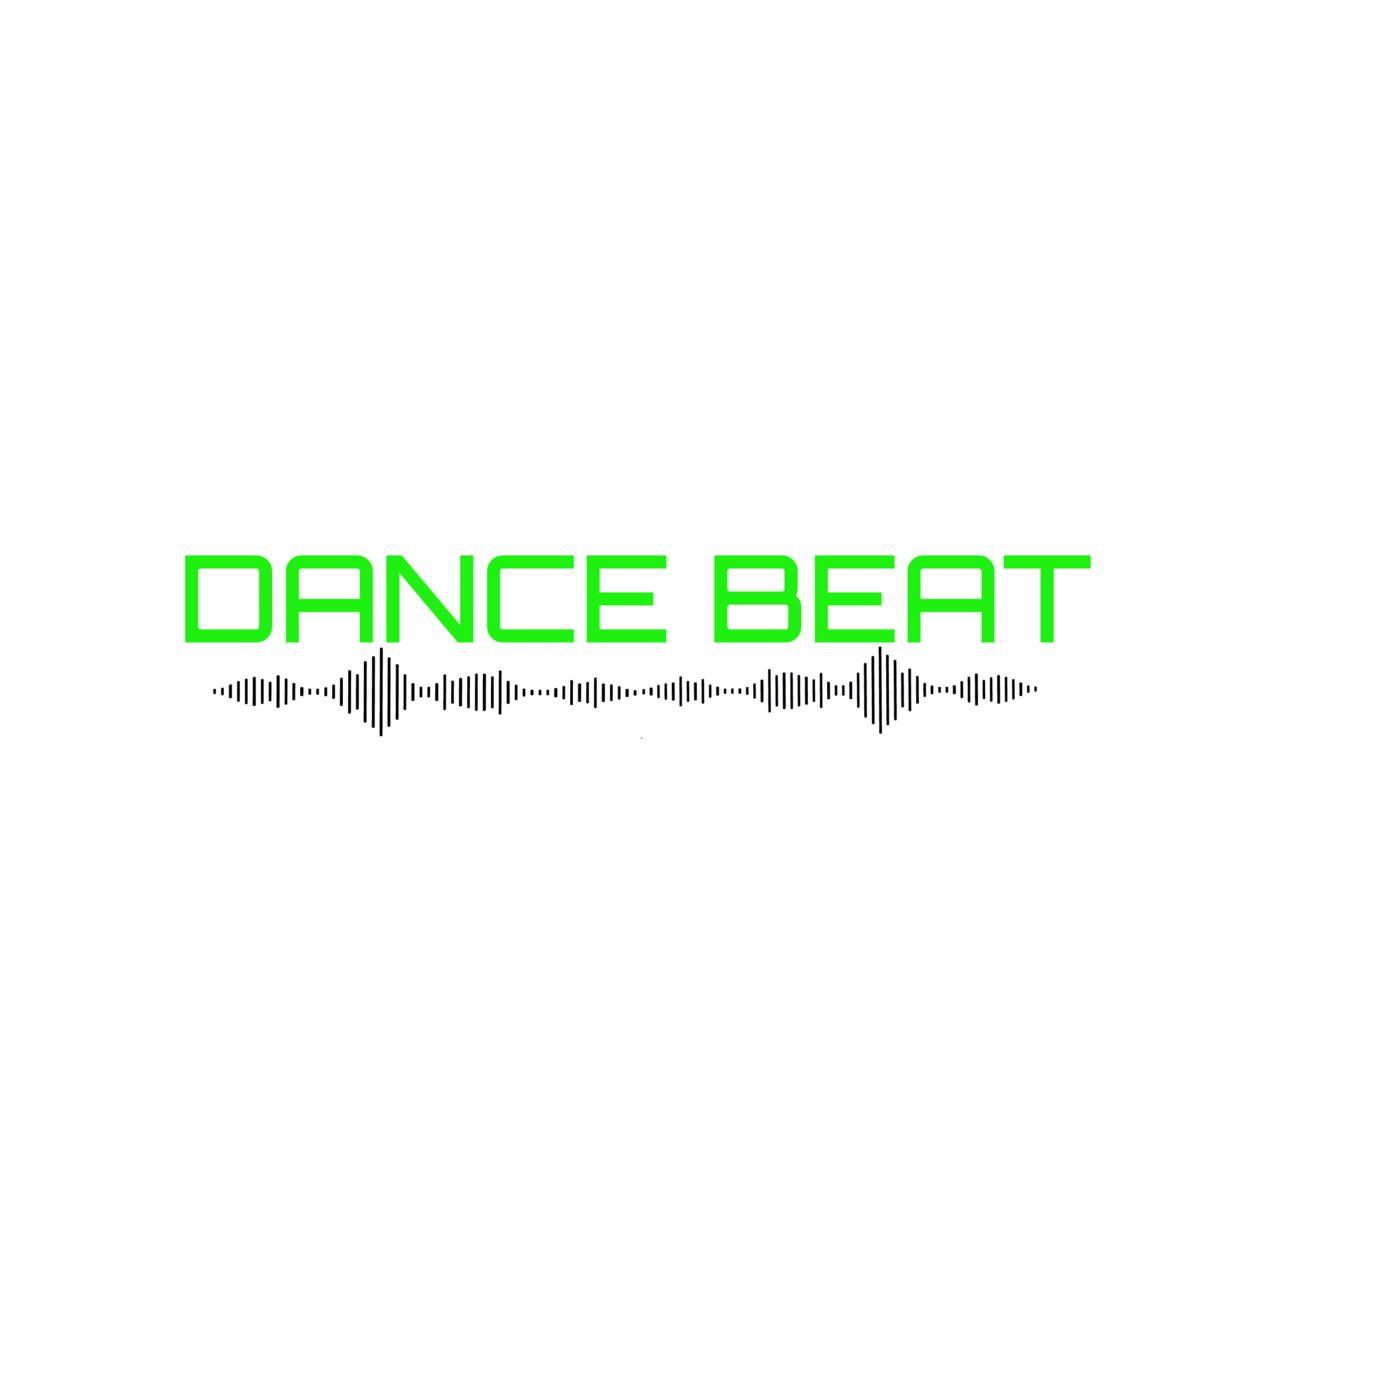 Dance Beat Ruah